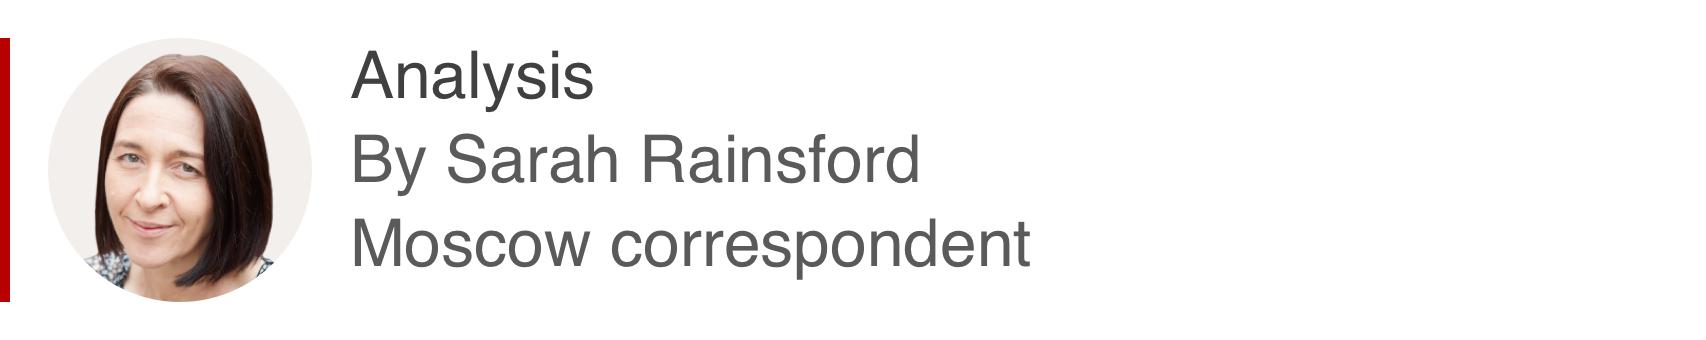 Analysis box by Sarah Rainsford, Moscow correspondent